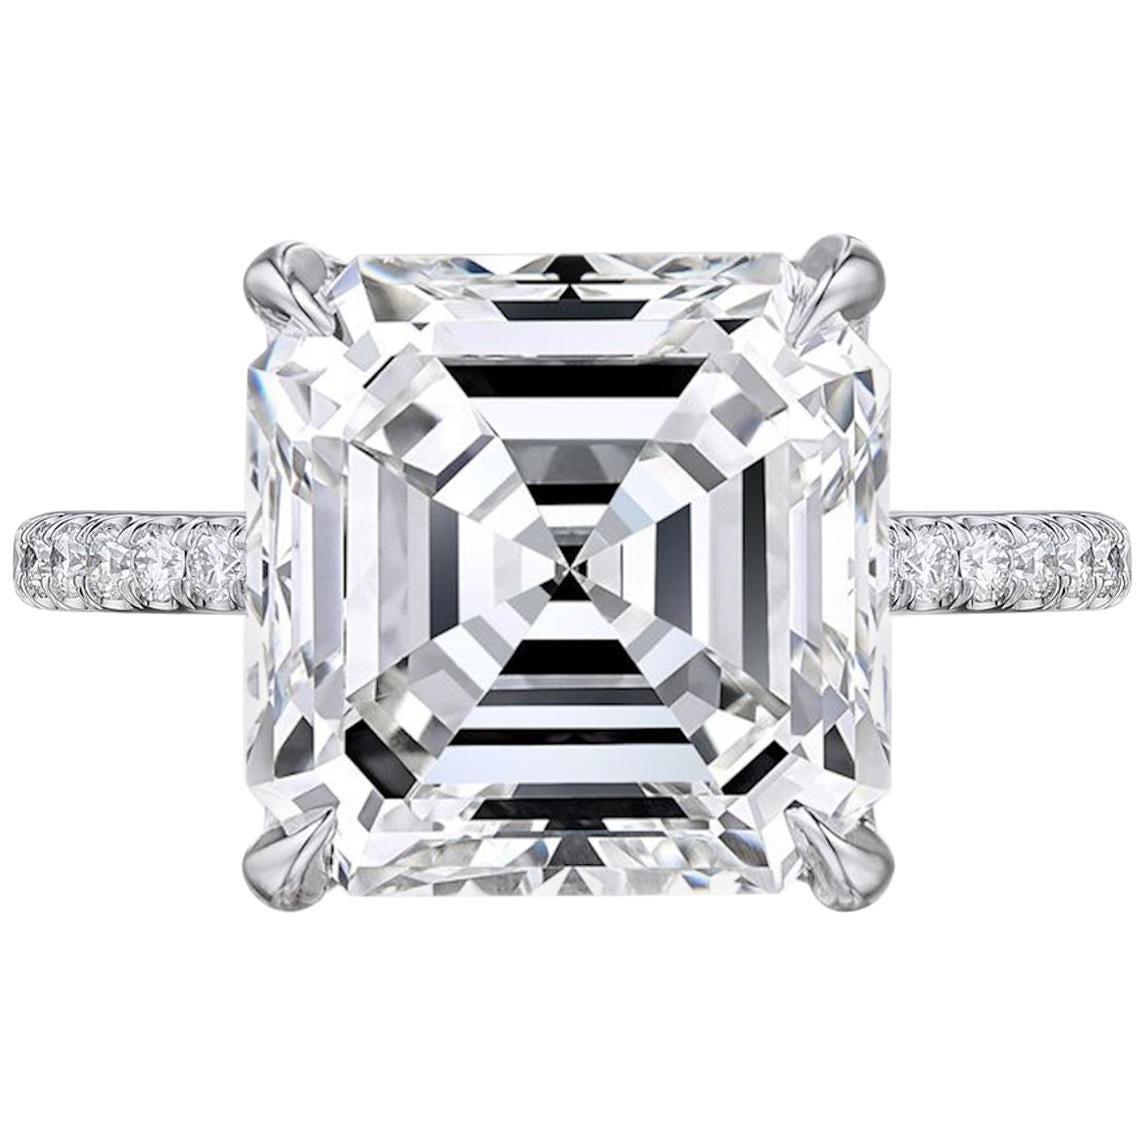 GIA Certified 8.75 Carat Square Emerald Cut Diamond VVS2 Clarity H Color